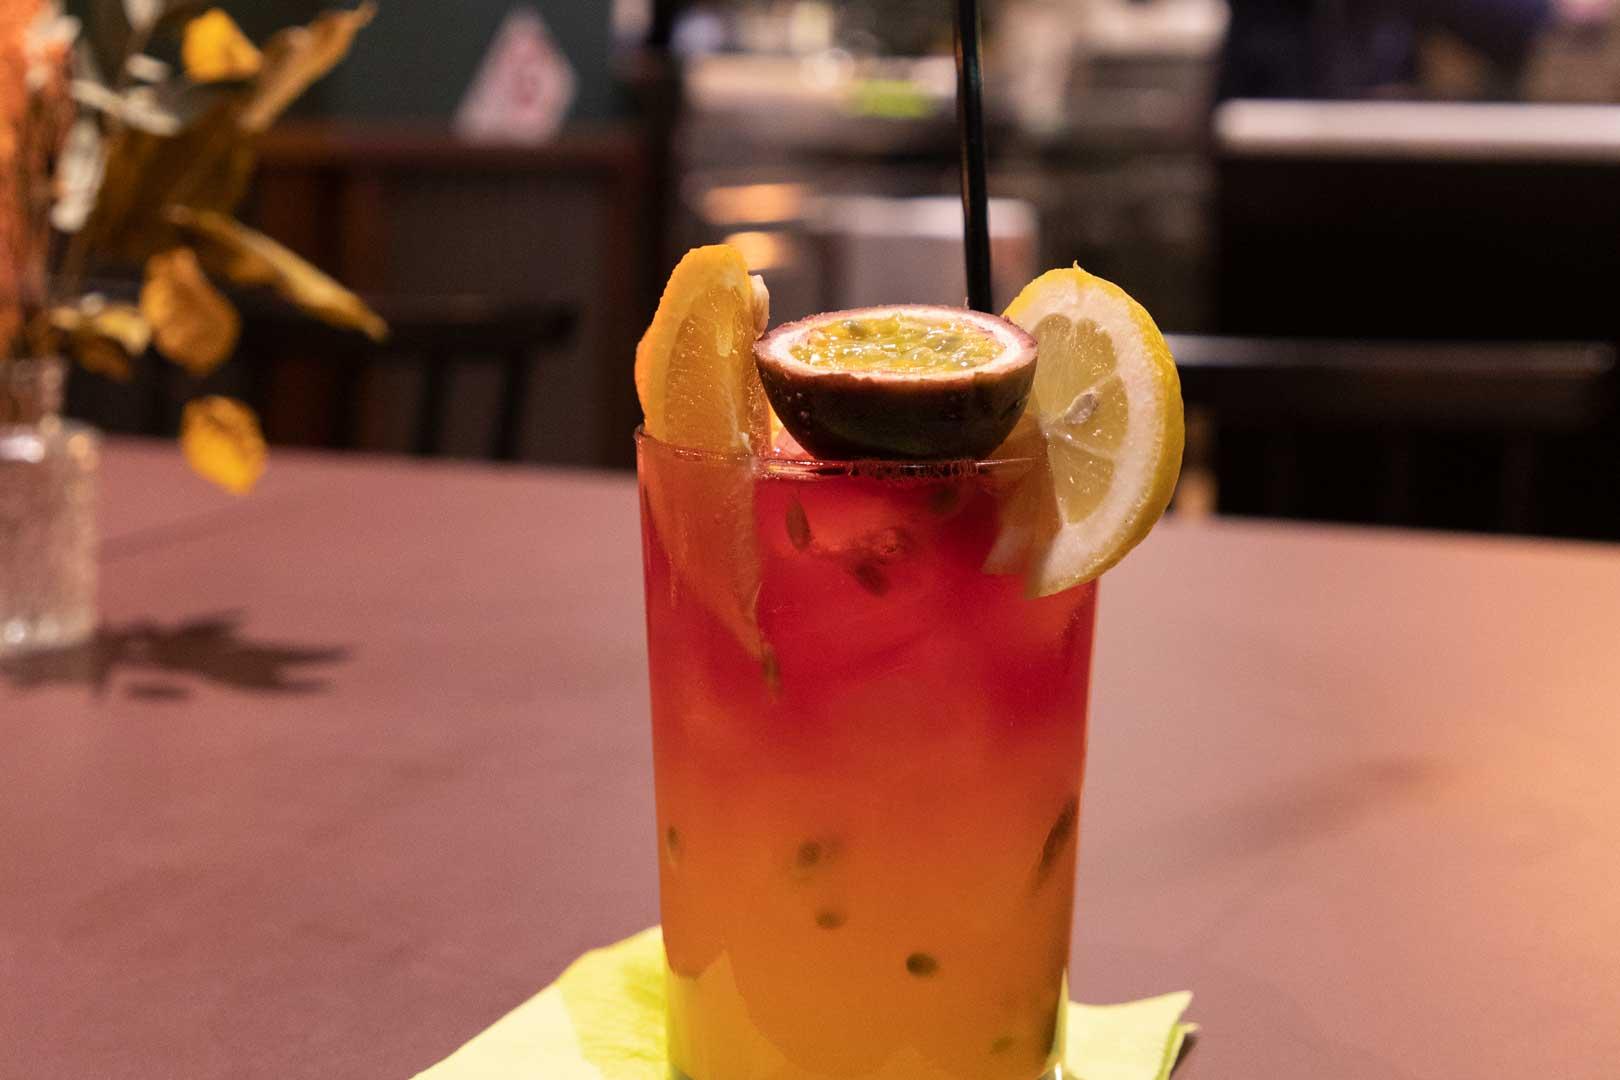 il-menu-invernale-di-posta-bistrot-cocktail